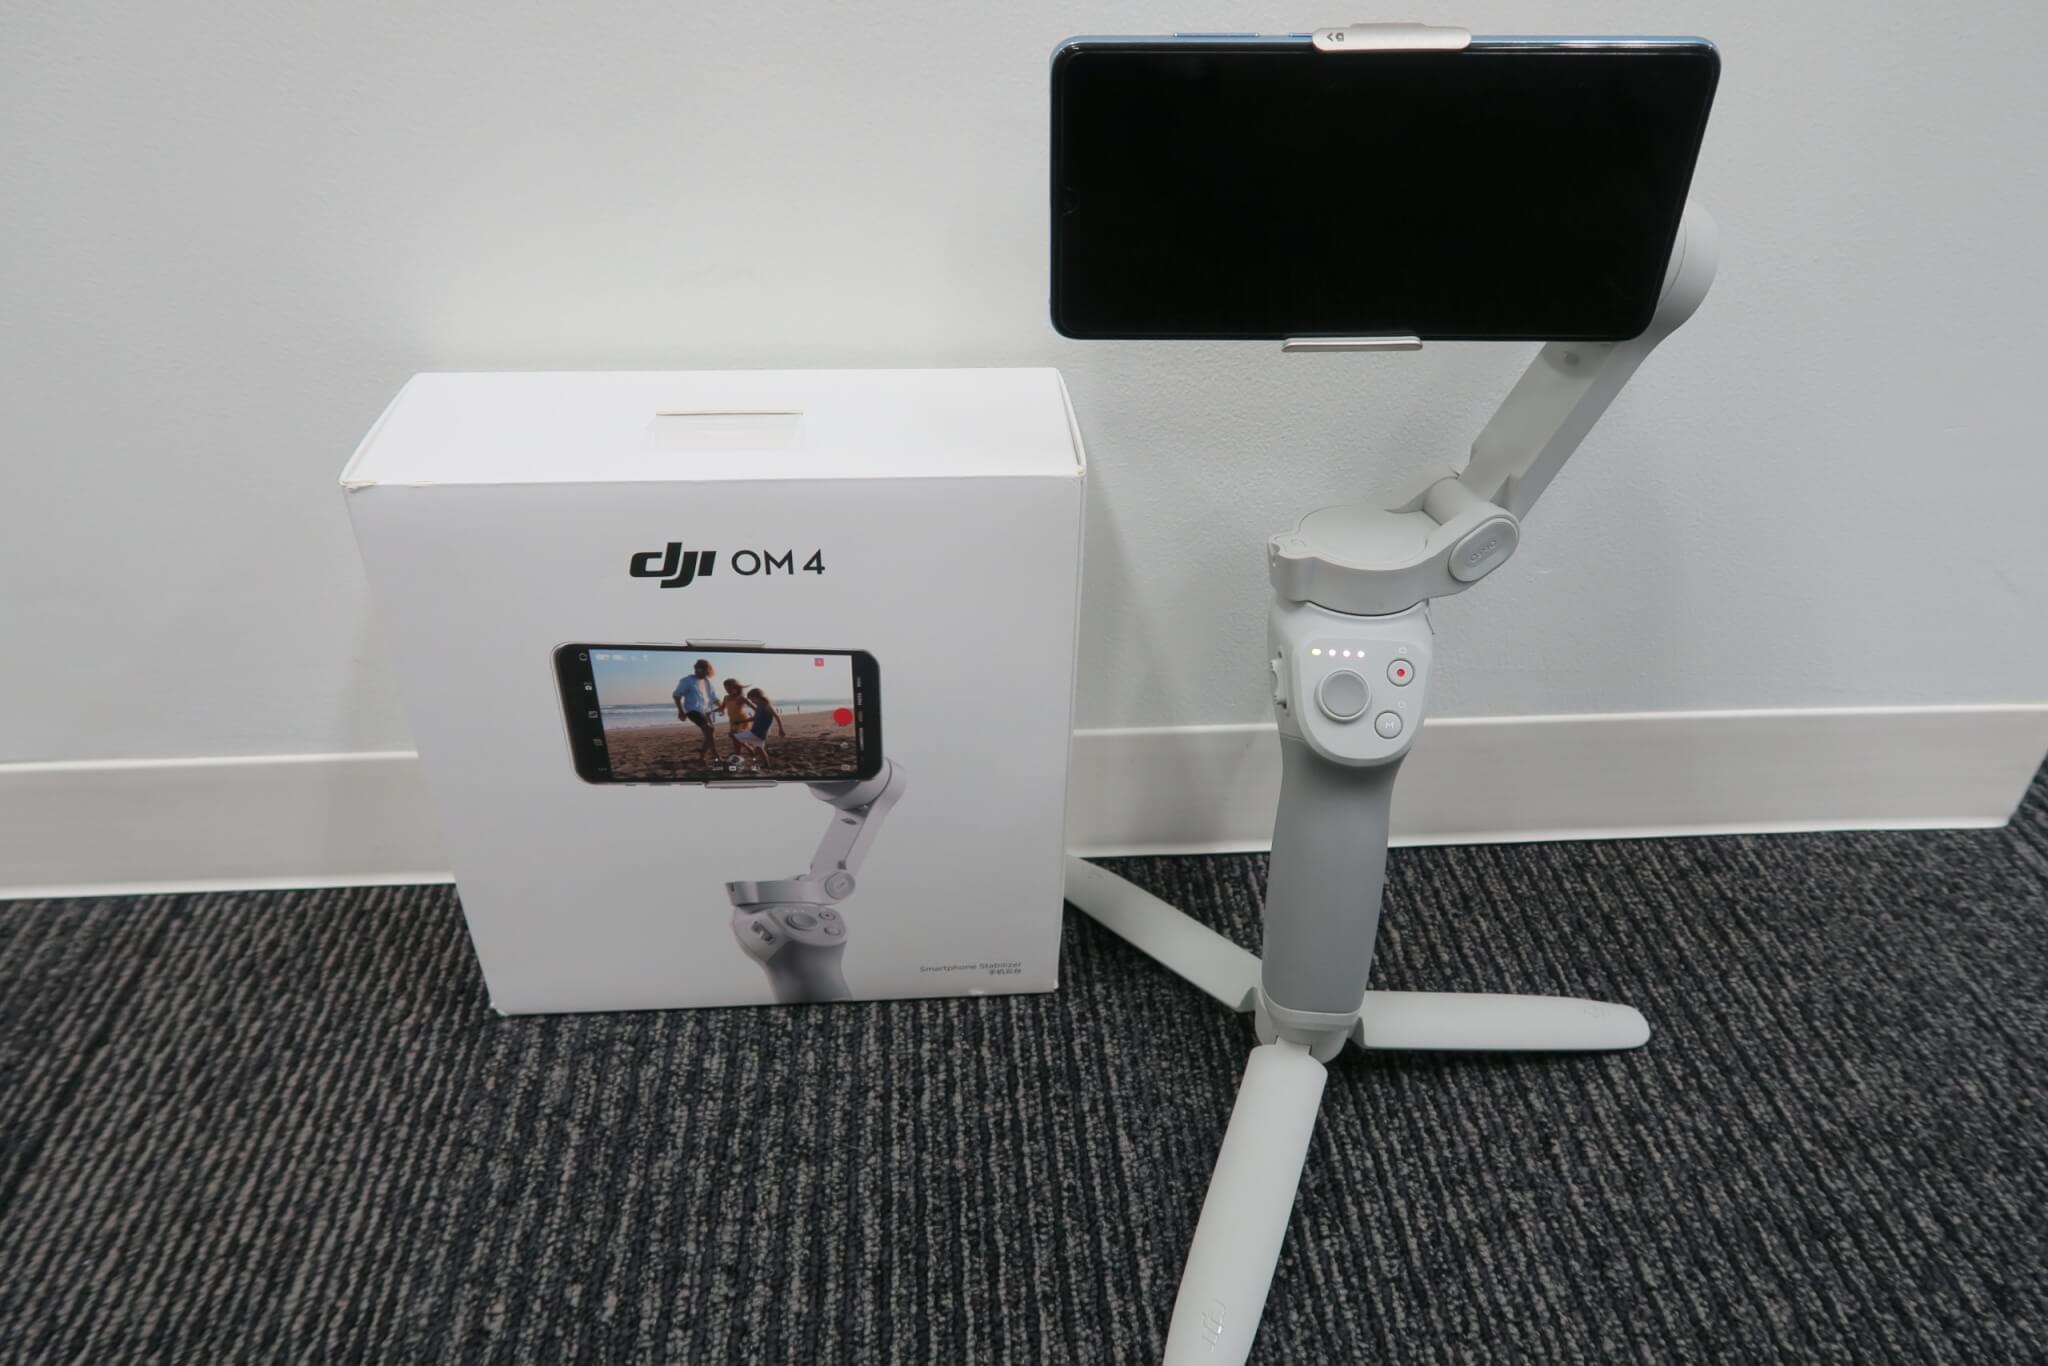 DJI OM4を実機レビュー。新たな機能やOsmo Mobile3との違いを徹底検証!